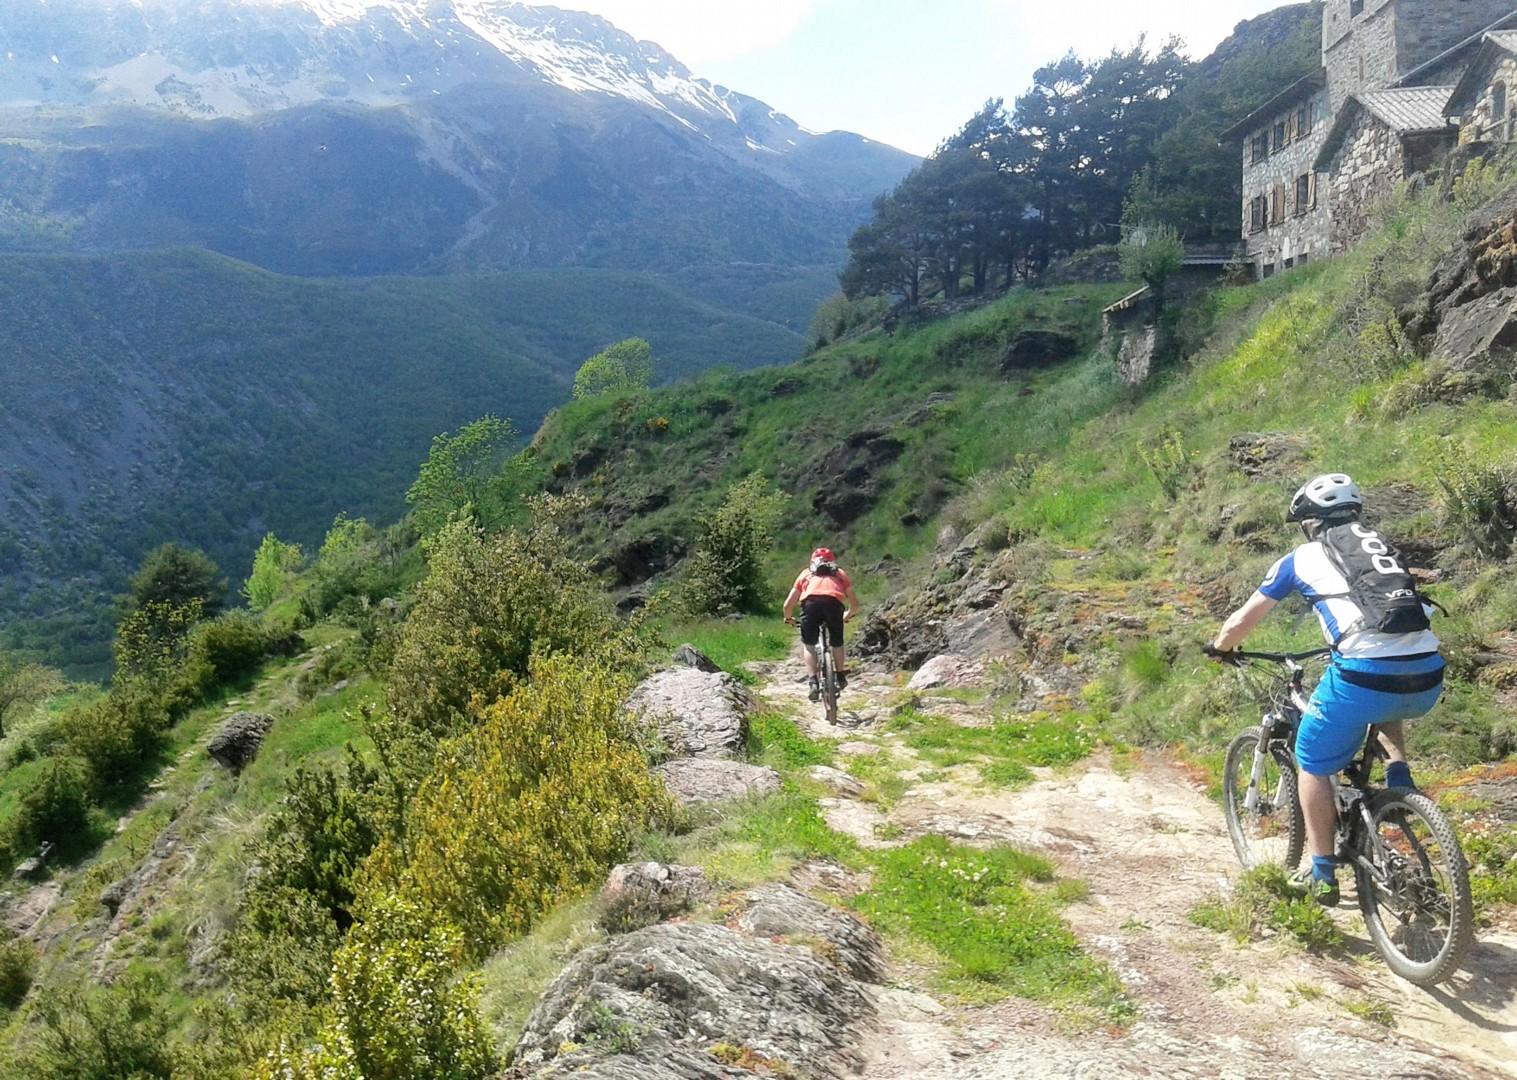 20160516_161806.jpg - Spain - Pyrenees Enduro - Guided Mountain Bike Holiday - Mountain Biking